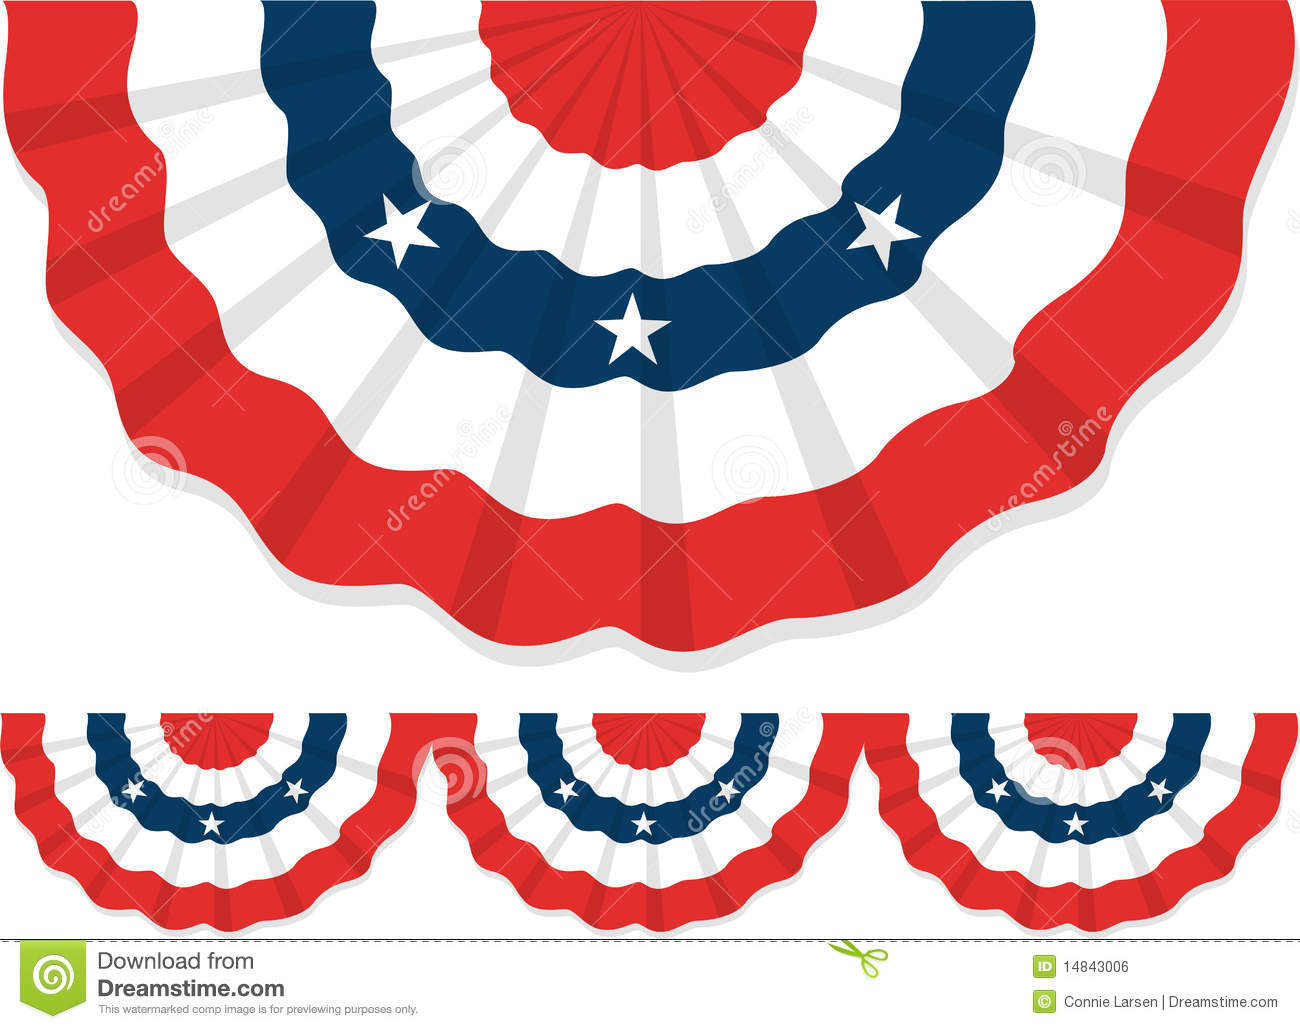 Free Patriotic Vector Graphics